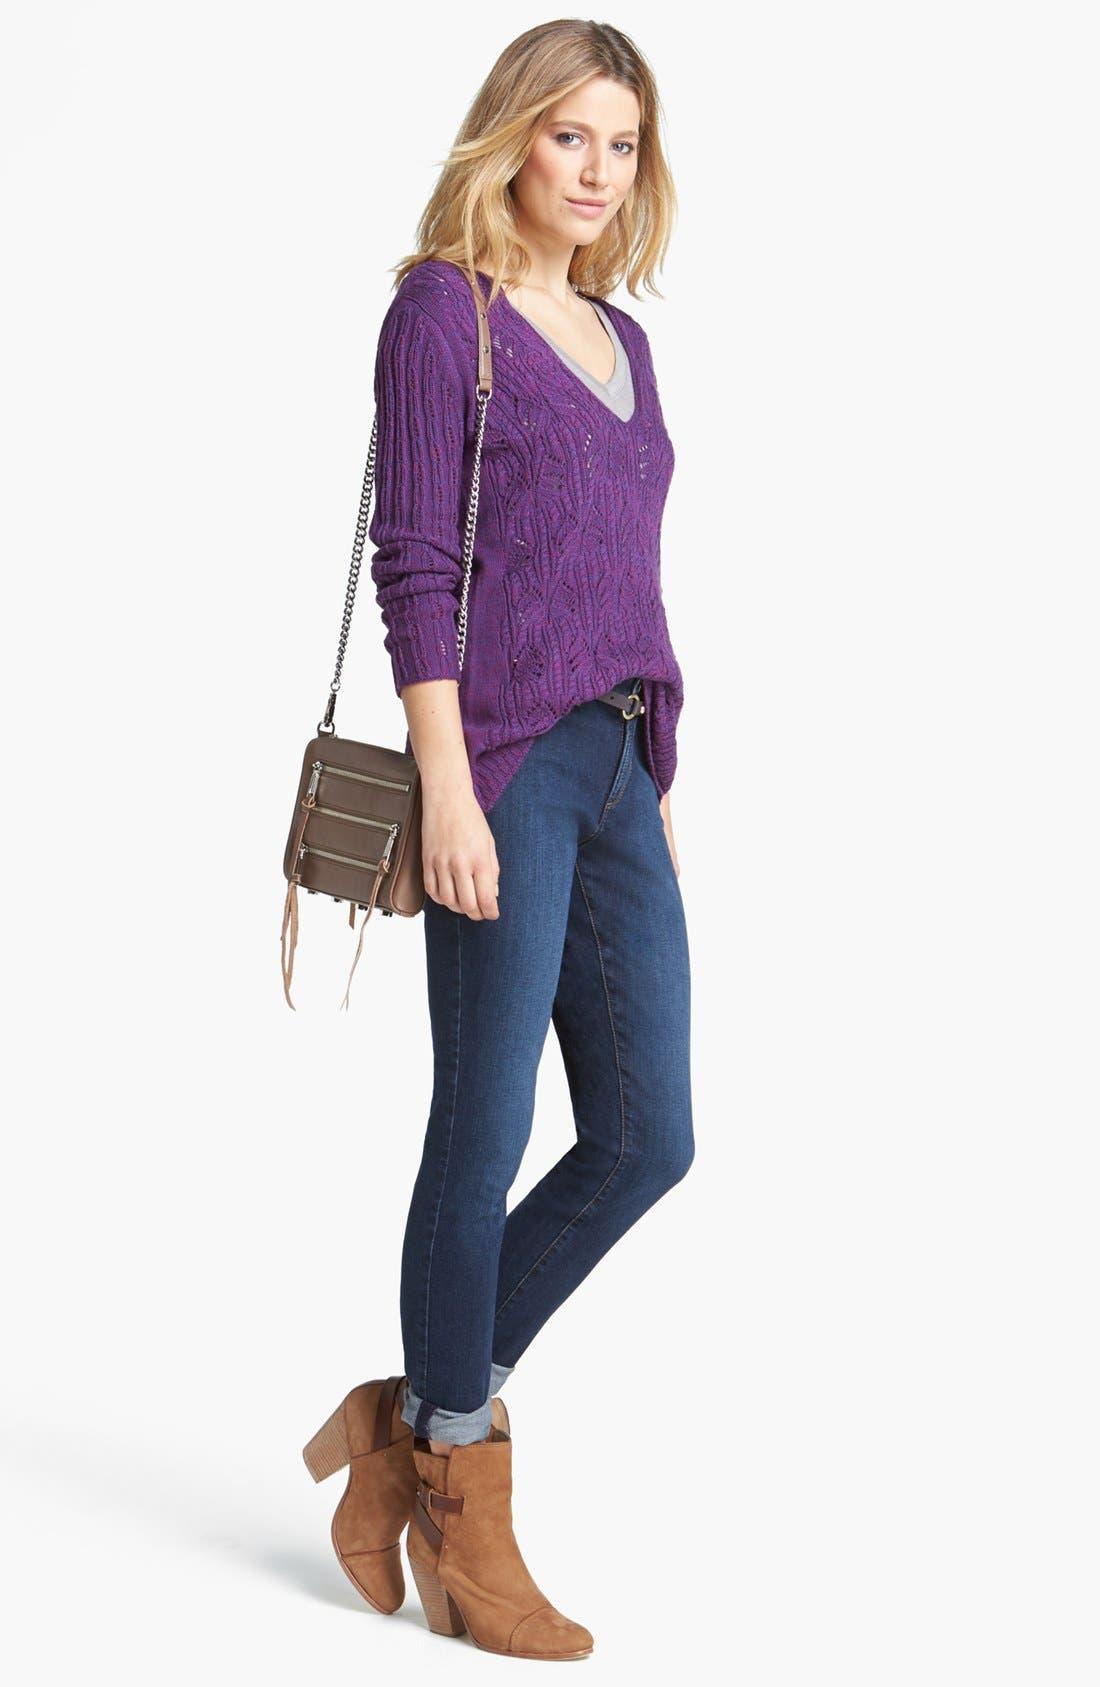 Alternate Image 1 Selected - Nic + Zoe Sweater & NYDJ Skinny Boyfriend Jeans